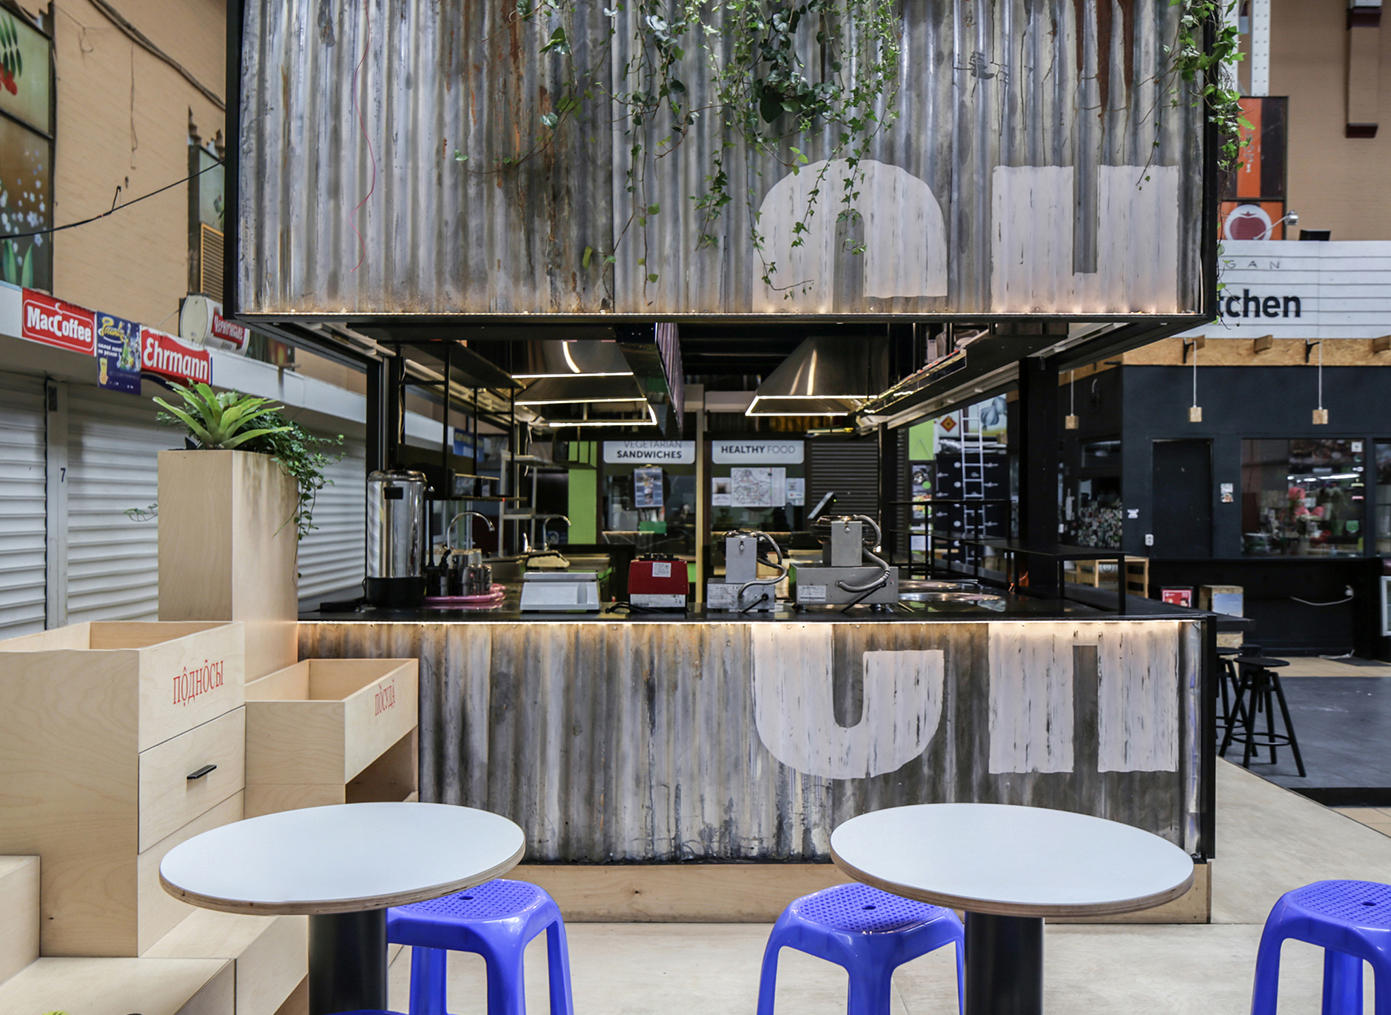 VIETNAM HI  / street food cafe, 40 sq. m, Kyiv